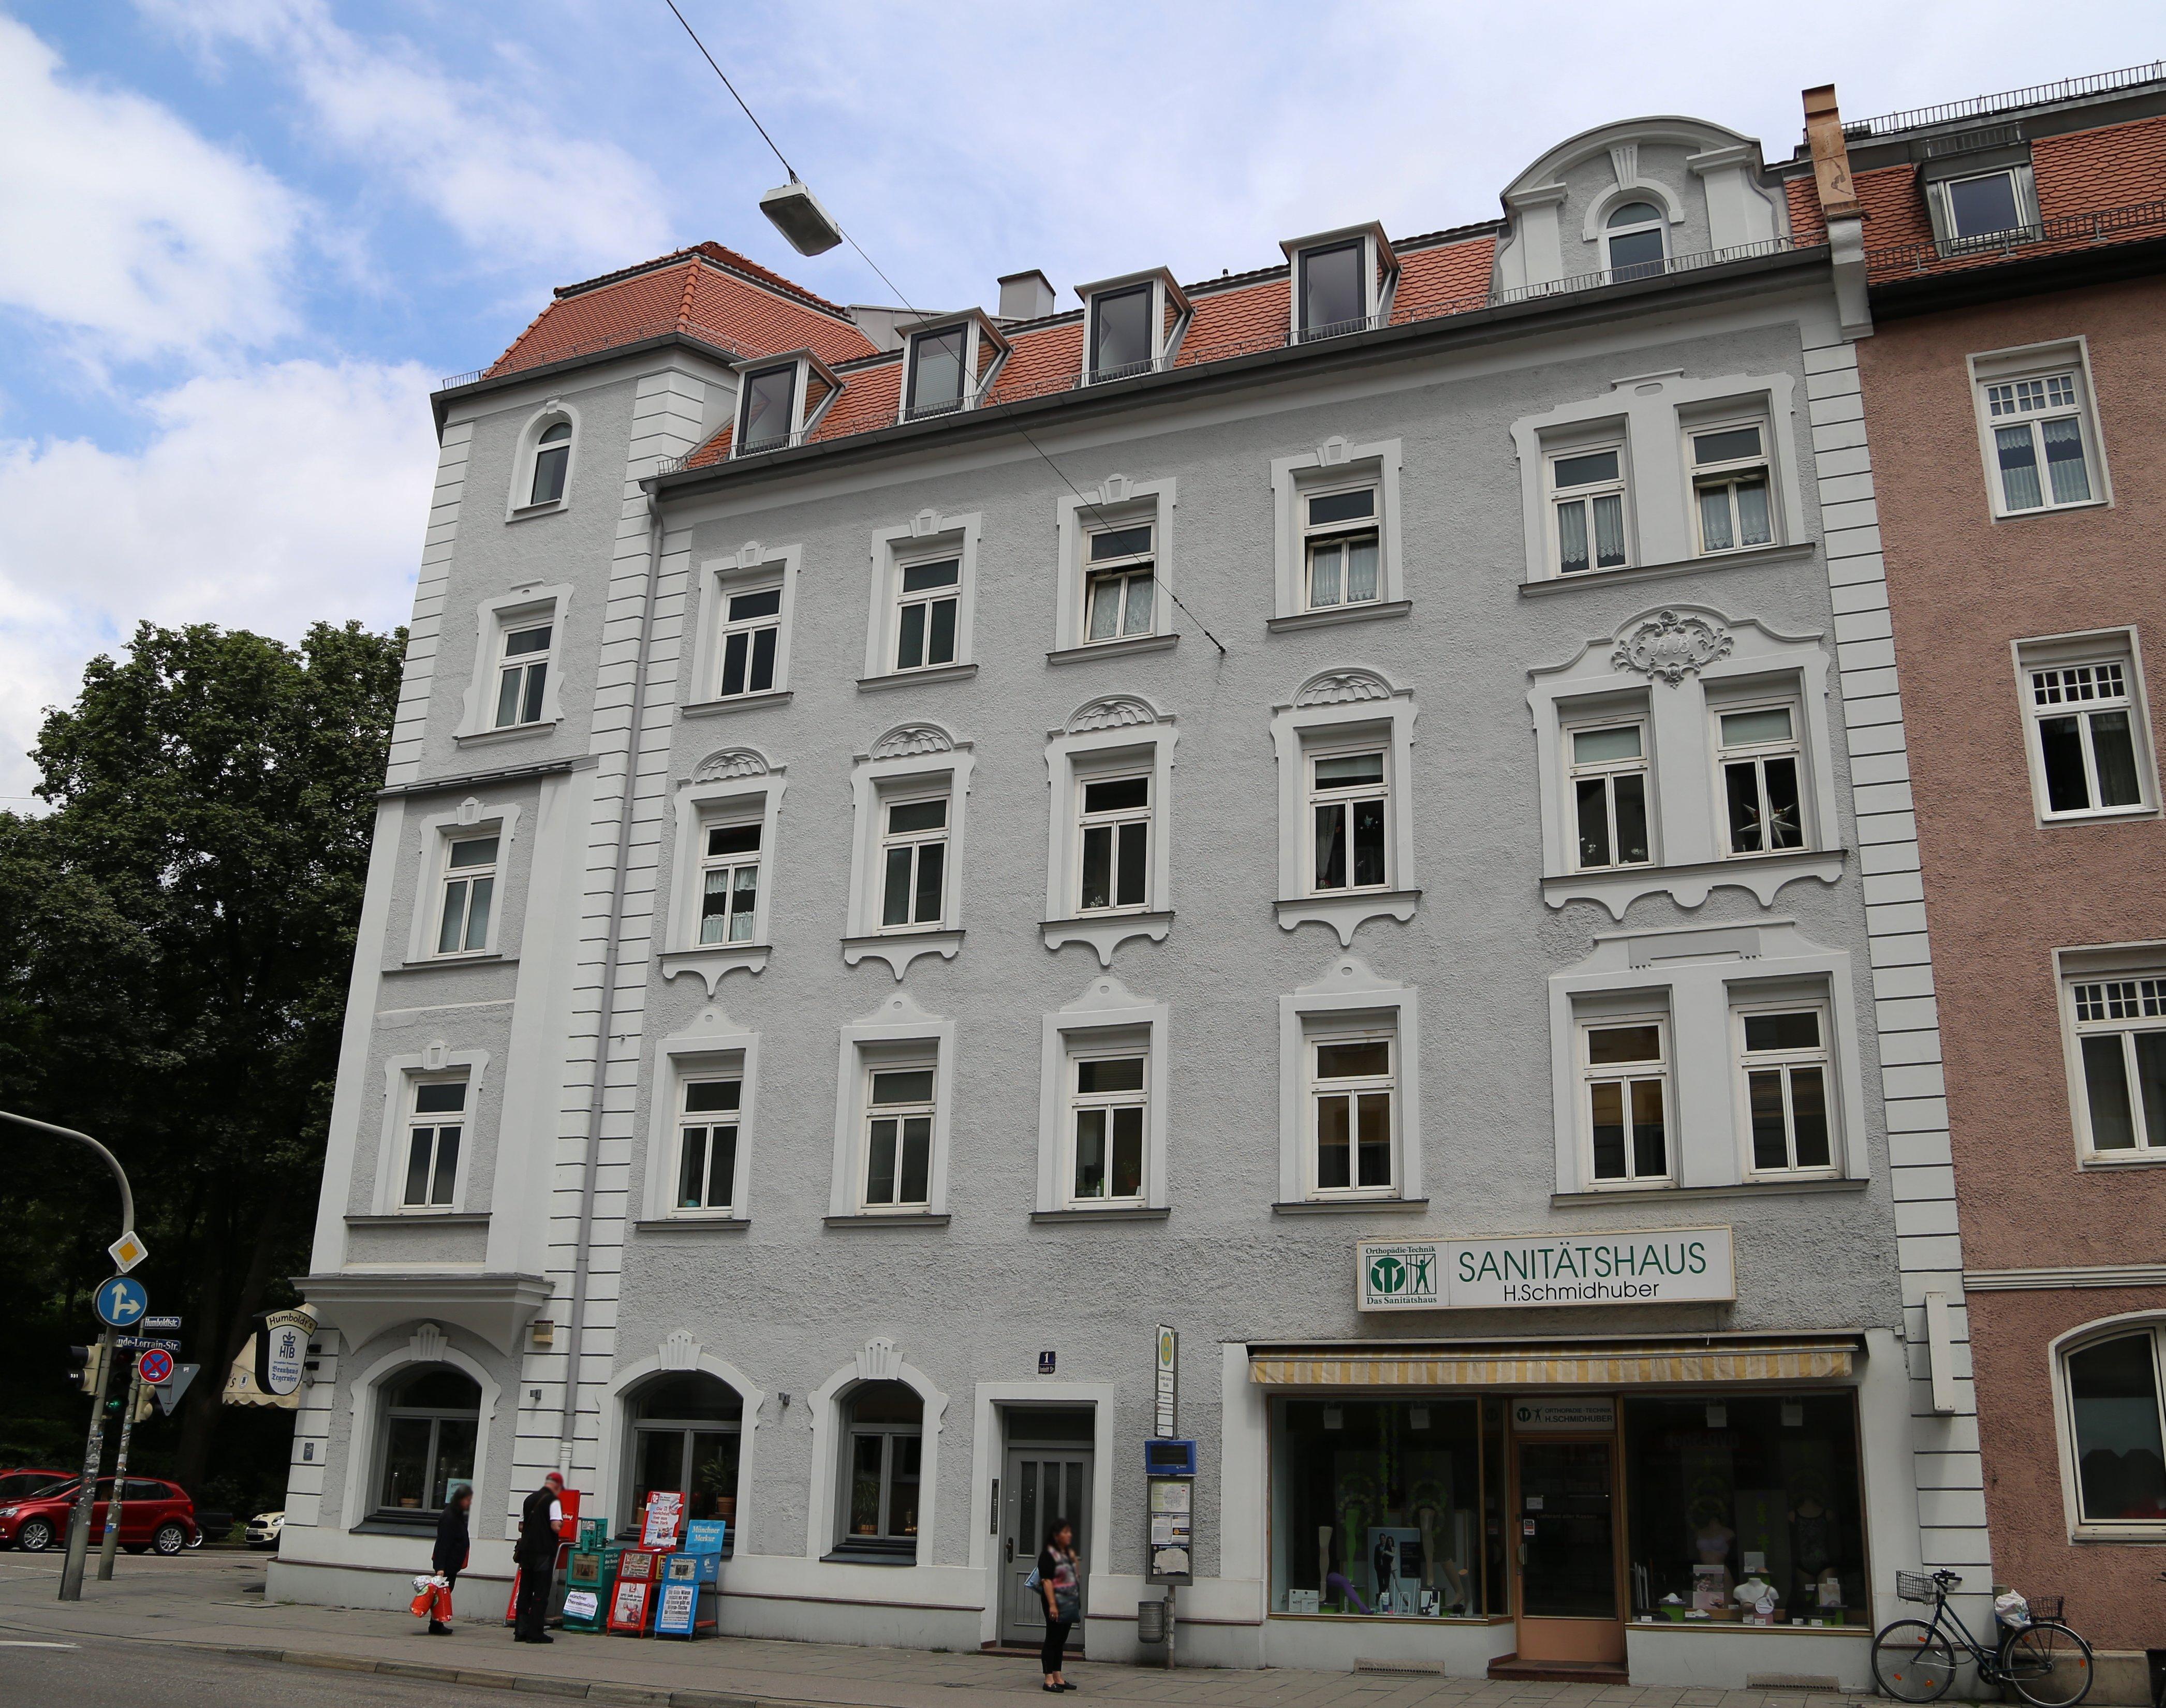 Humboldtstr München file humboldtstr 1 muenchen 3 jpg wikimedia commons